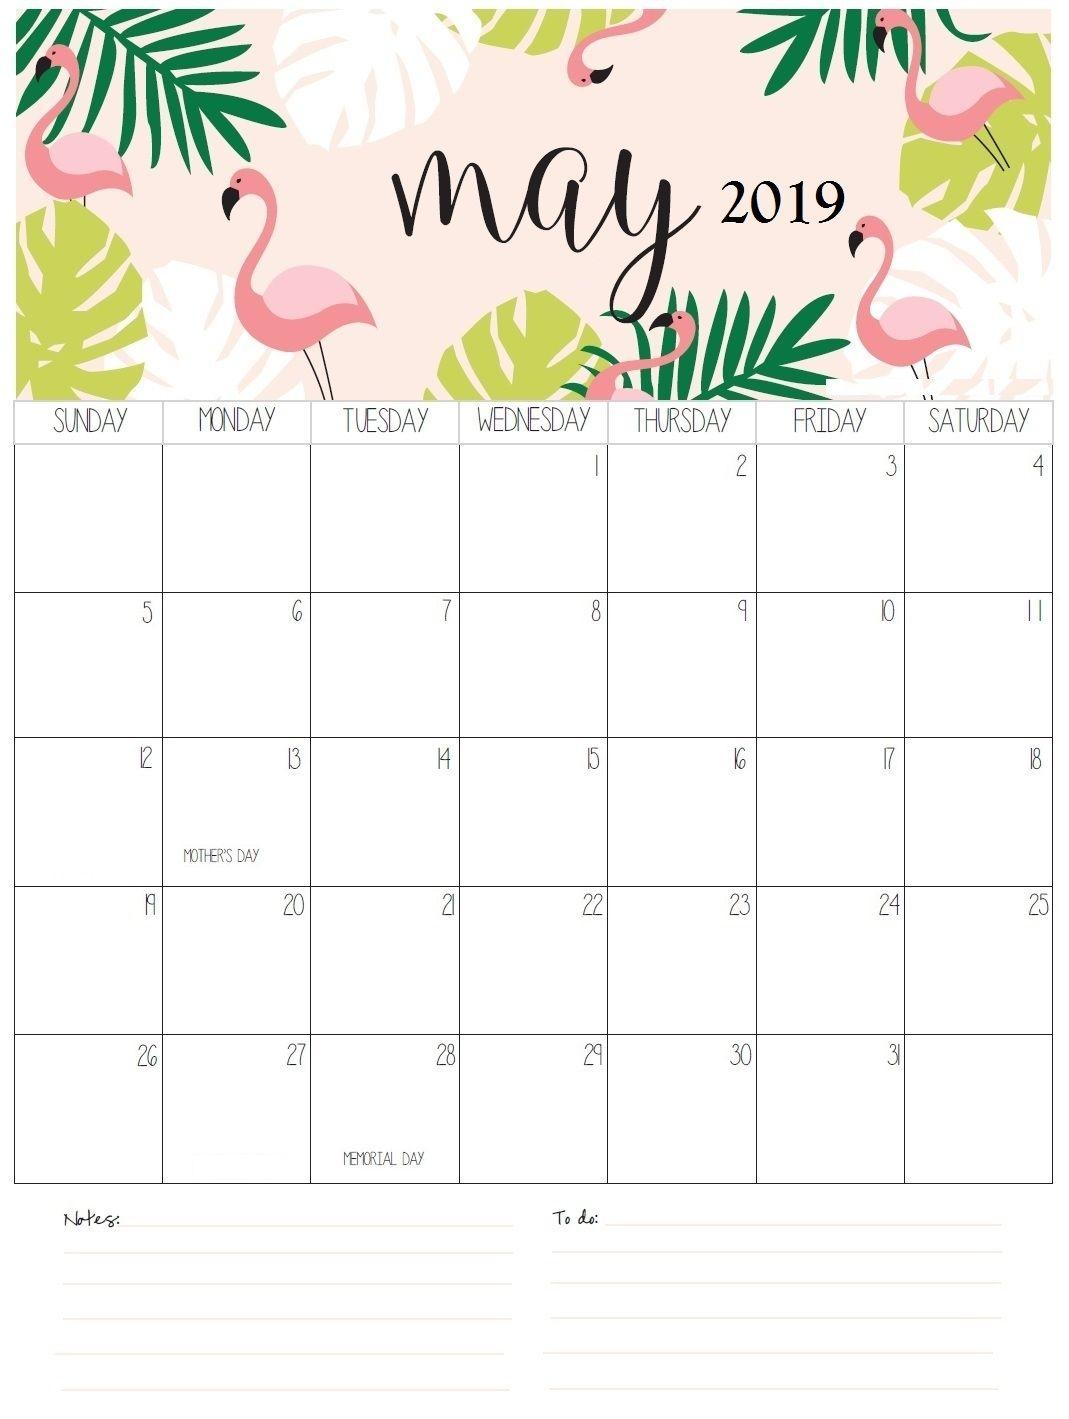 Download May 2019 Printable Calendar Template Free